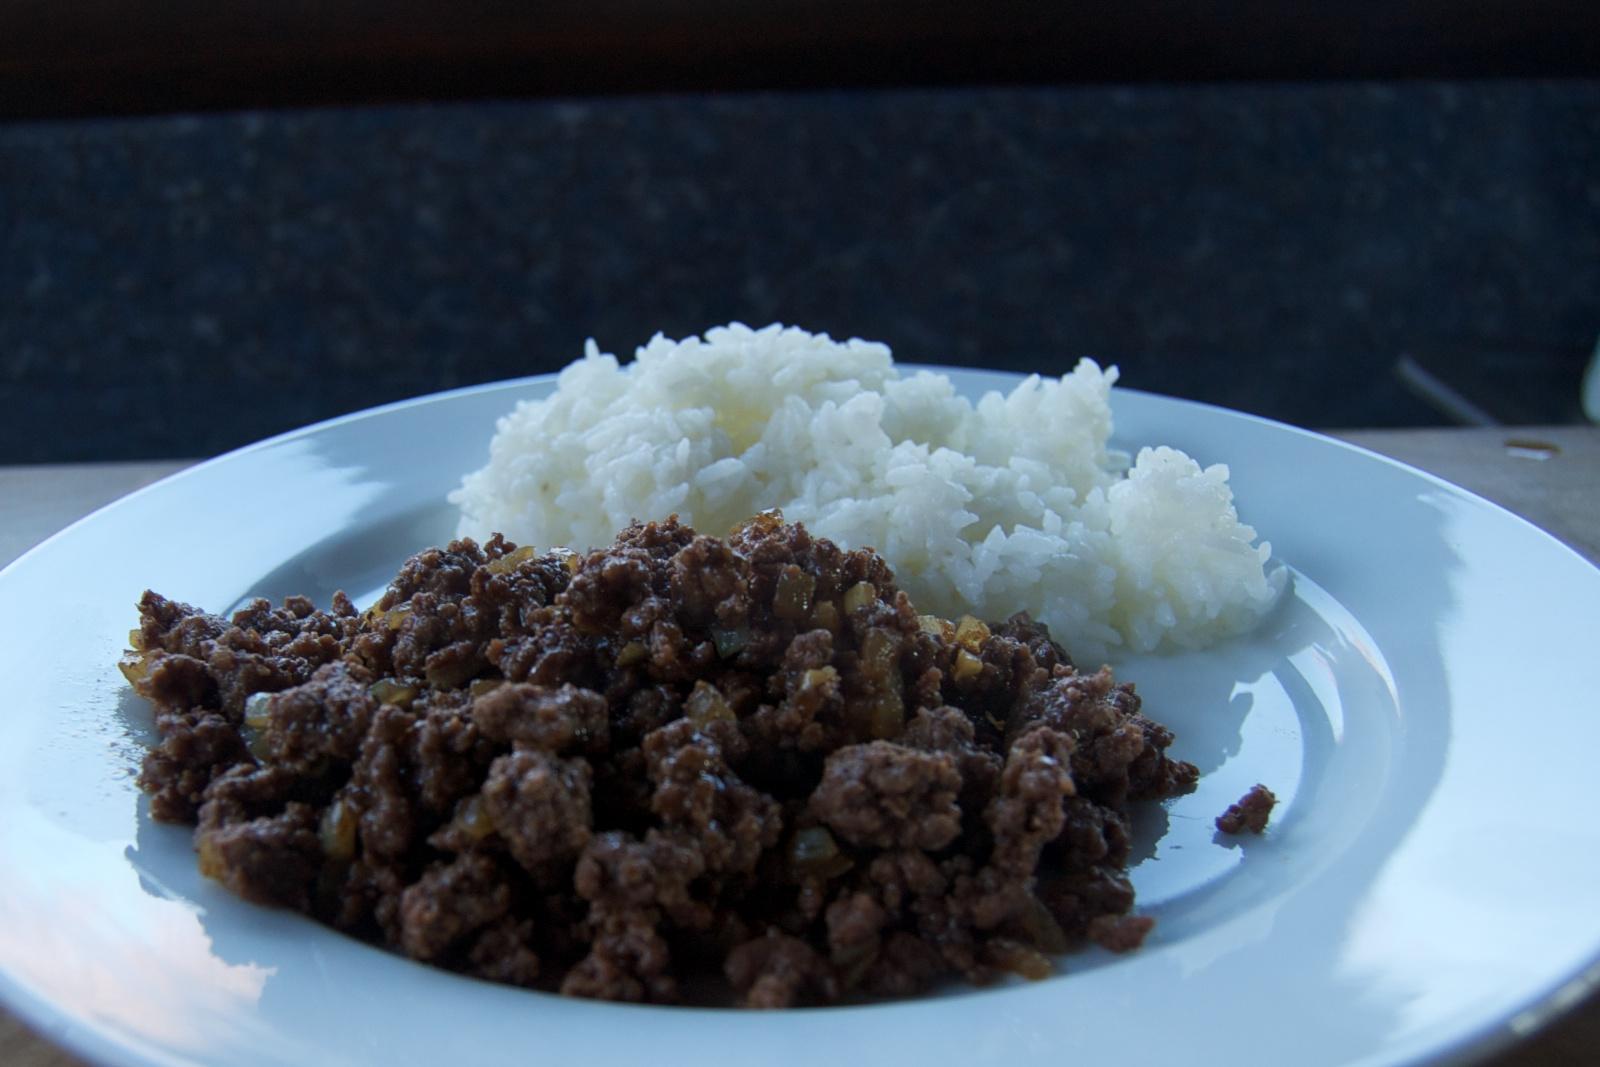 http://blog.rickk.com/food/2013/10/31/ate.2013.10.30.d.jpg